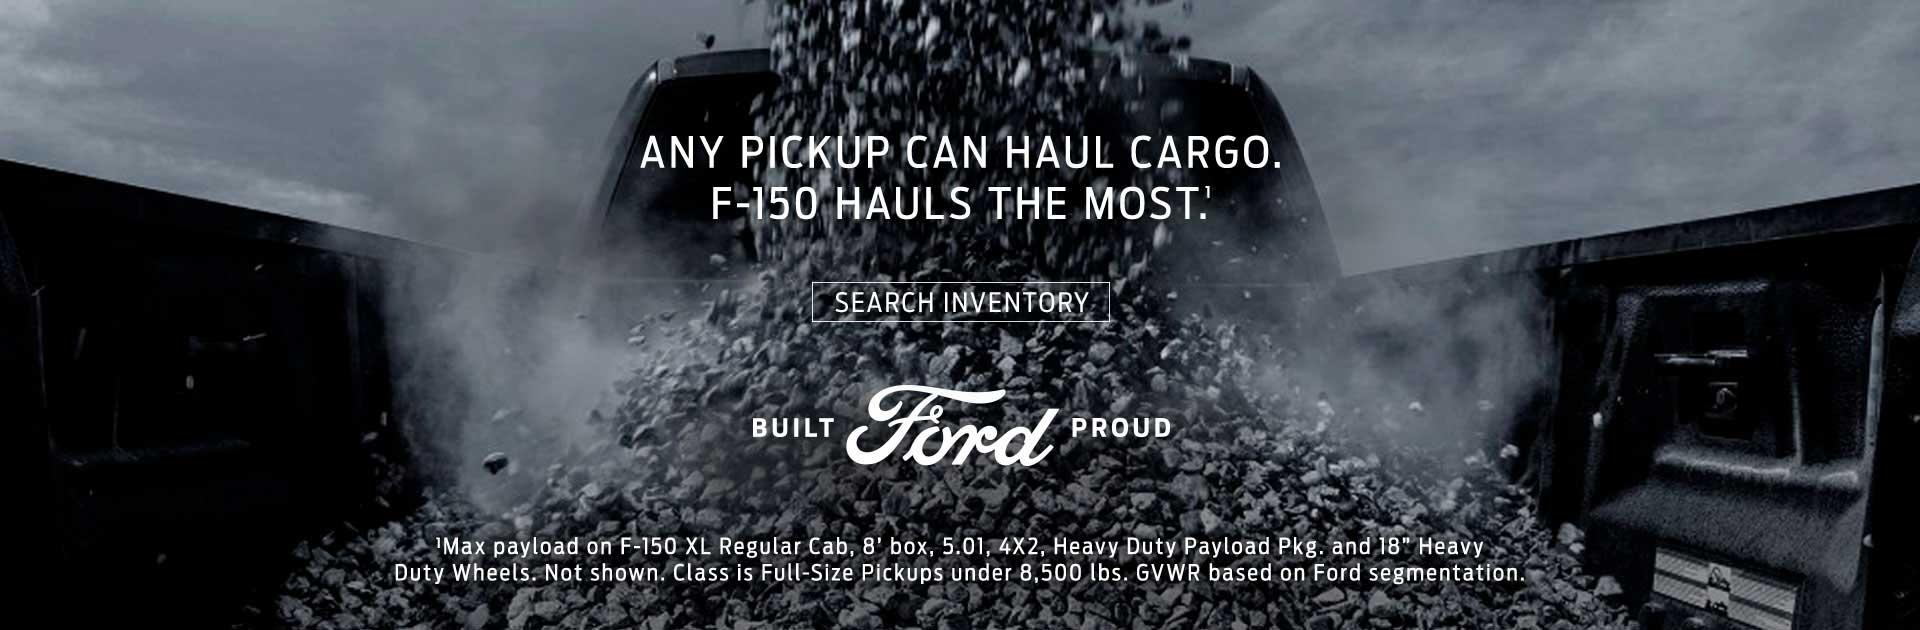 Sam Pack's Five Star Ford Lewisville | Lewisville, TX, Ford Dealer